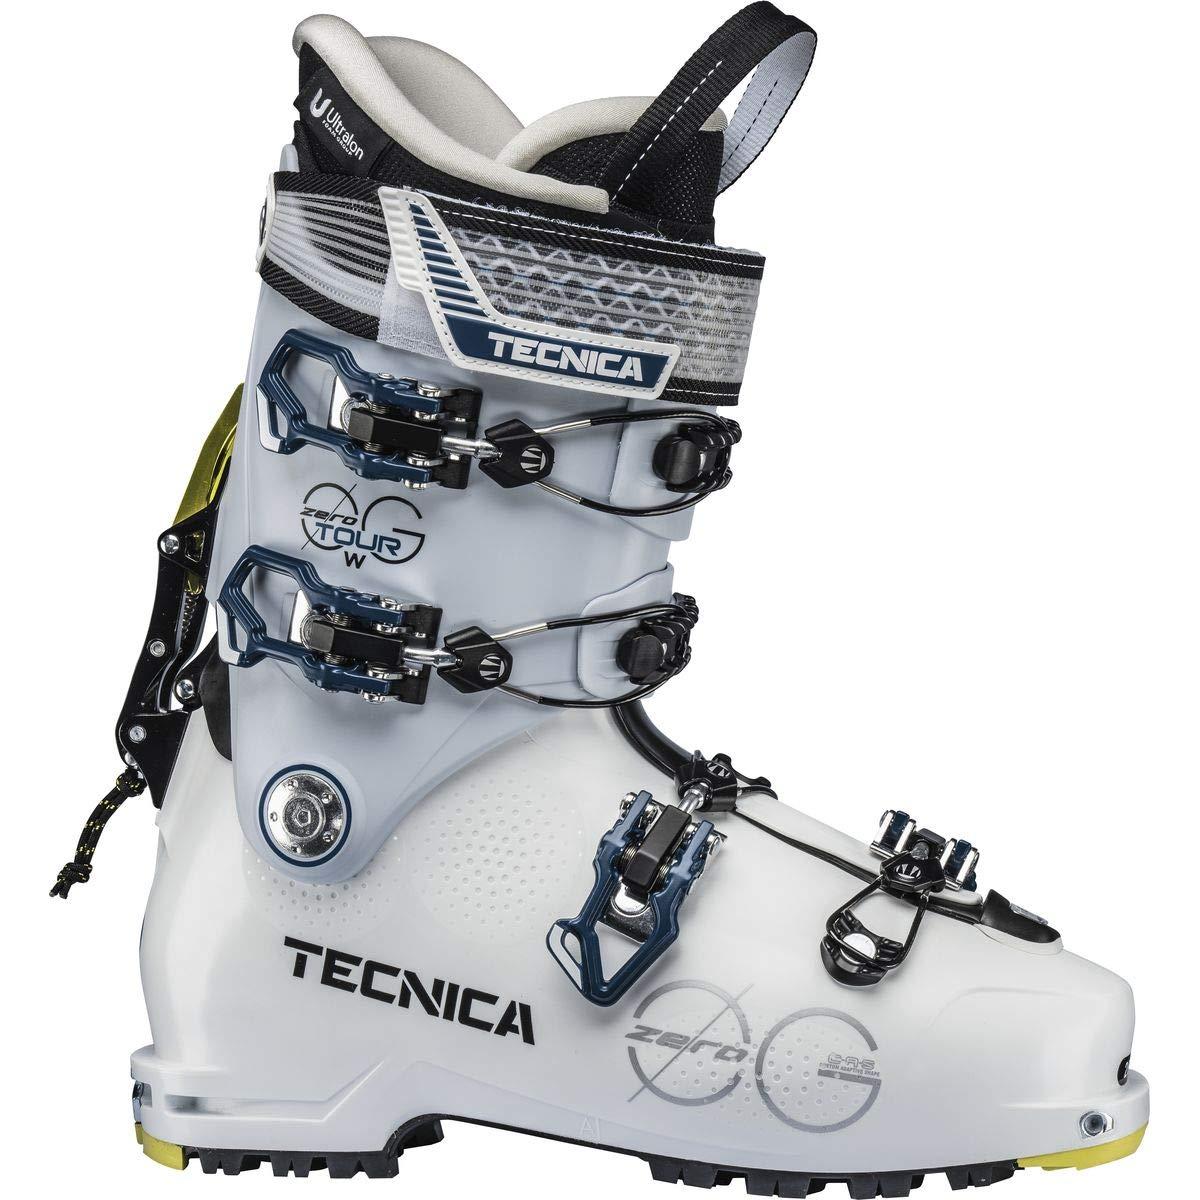 Tecnica Zero G Tour レディース ツーリング スキーブーツ ホワイト/アイス22.5   B07JR965N8